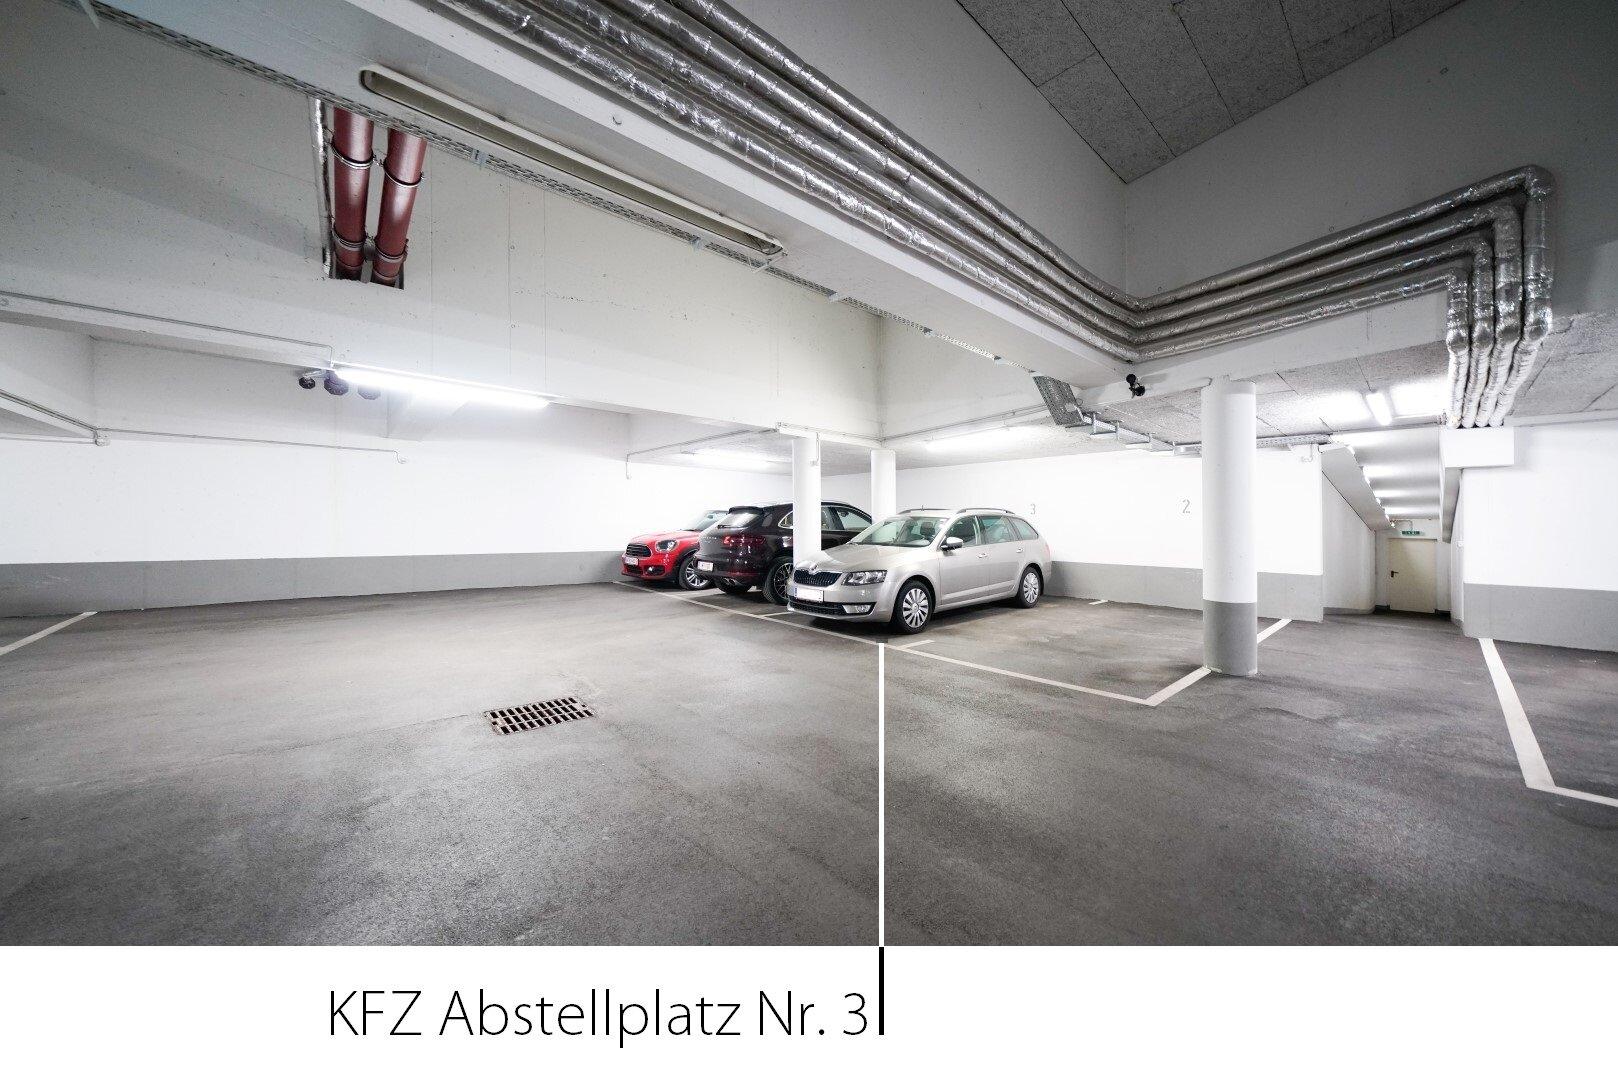 KFZ Abstellplatz